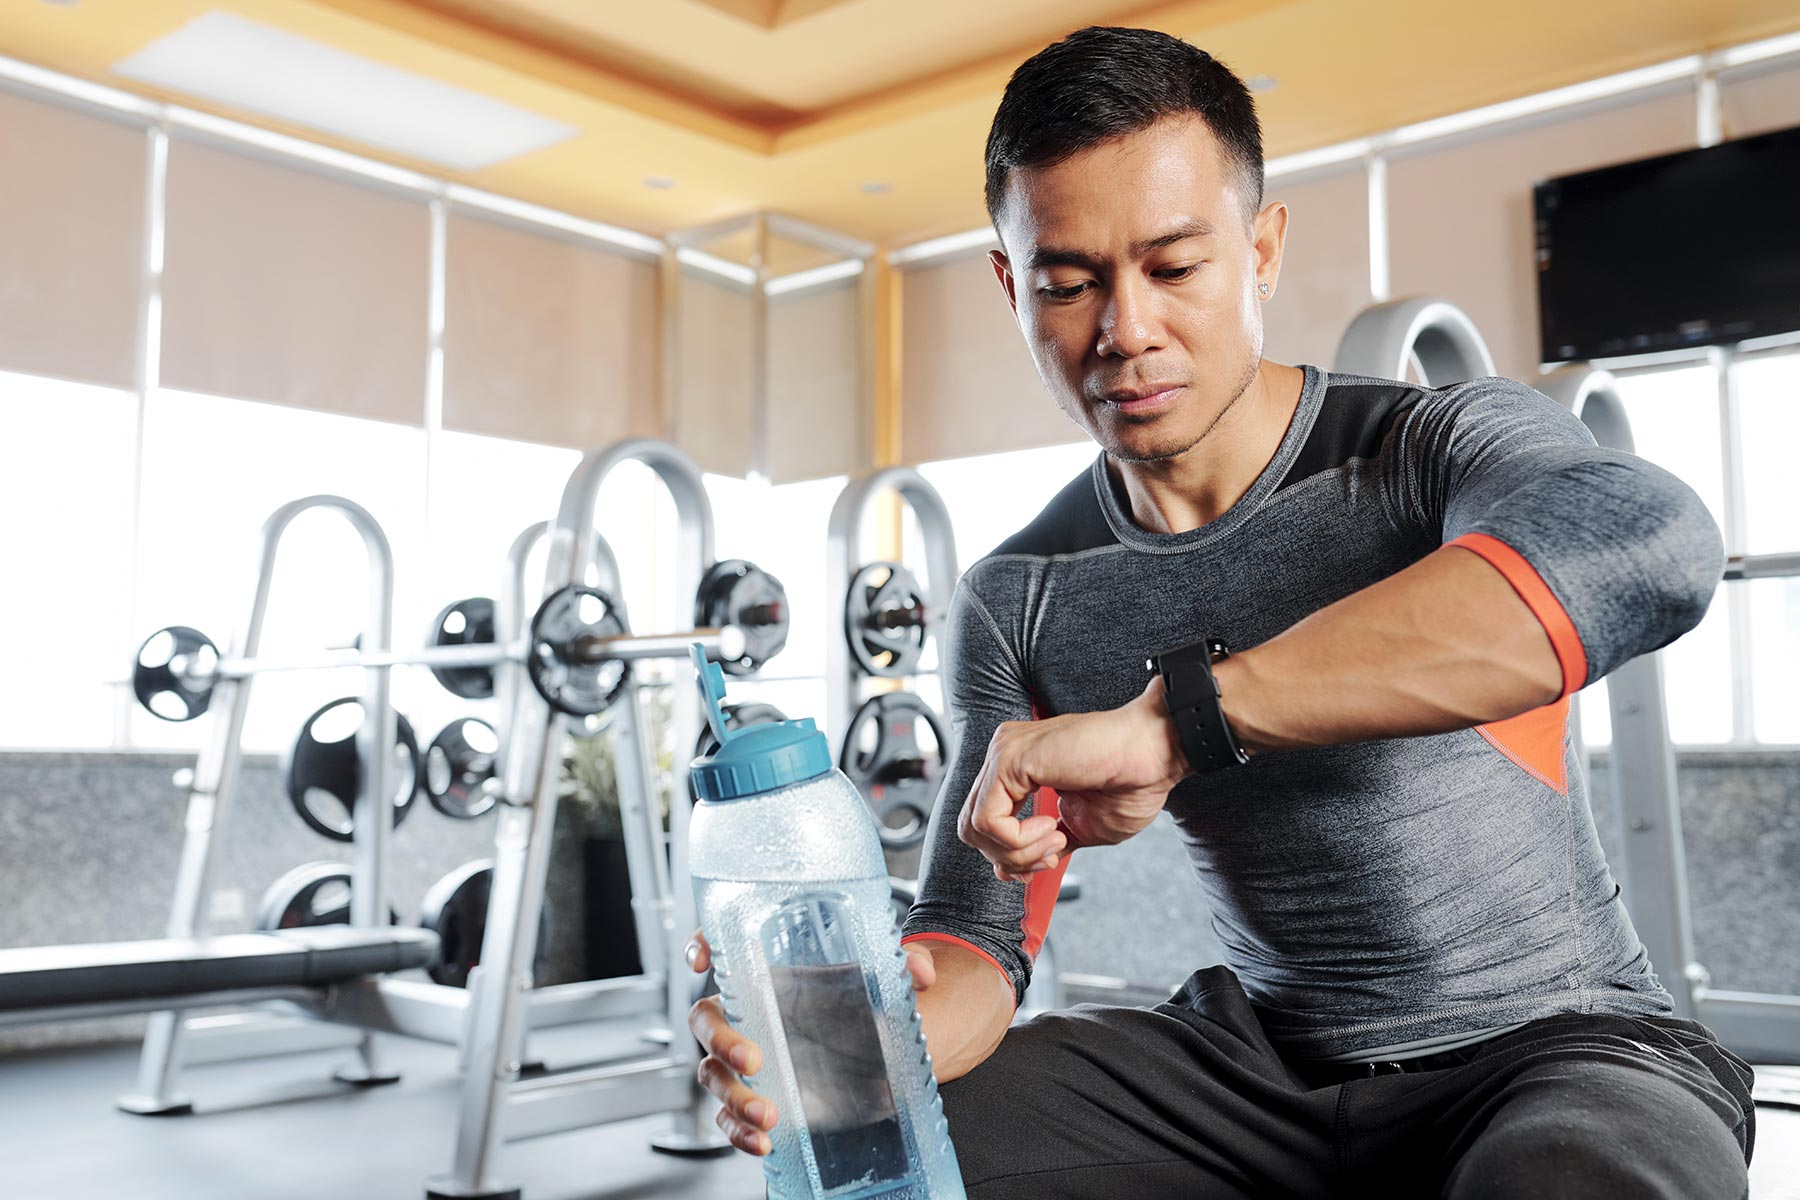 fit-man-checking-smart-watch-H8GR7B4.jpg